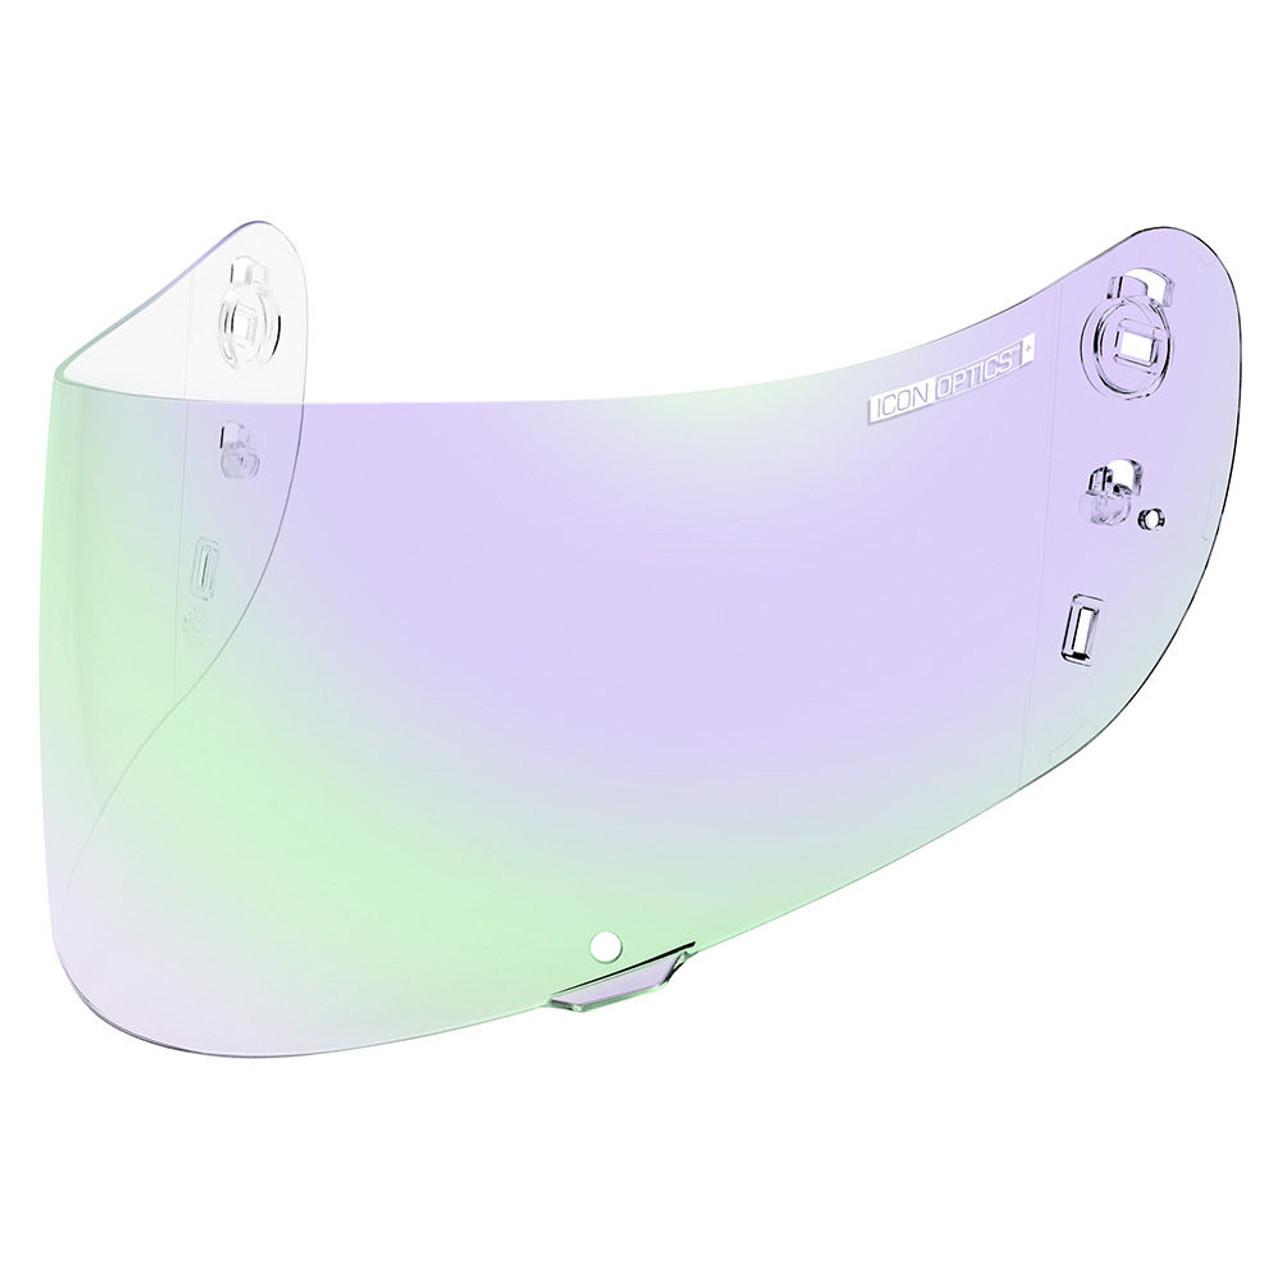 NEW ICON Variant Helmet  Shield RST Silver FREE SHIP GSXR CBR R6 ZX R1